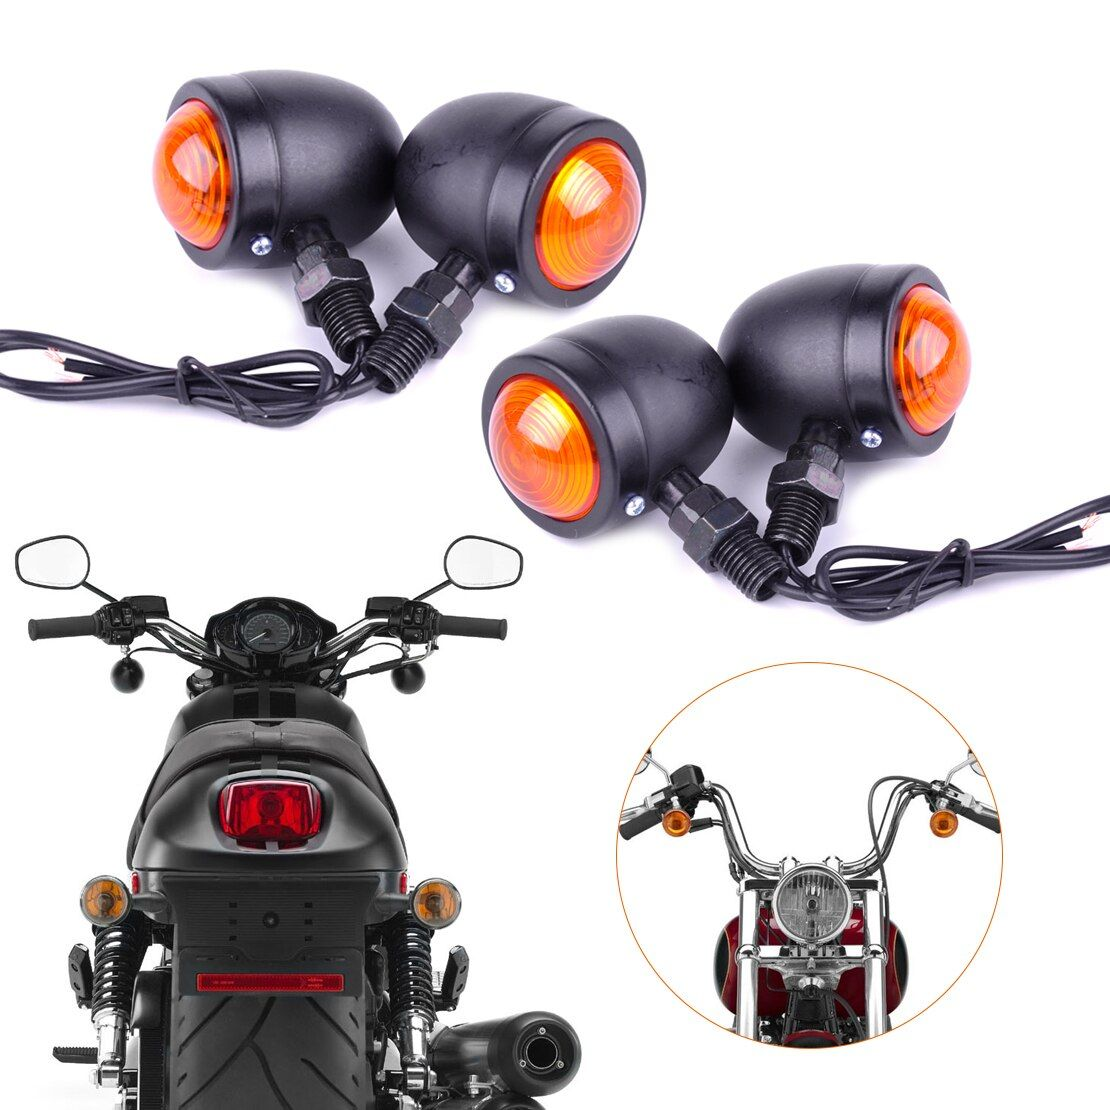 DWCX Motorrad 4x12 V Kugel Blinker Leuchtmelder Lampe Fit für Harley Bobber Chopper Yamaha Suzuki Kawasaki Dirt Bike